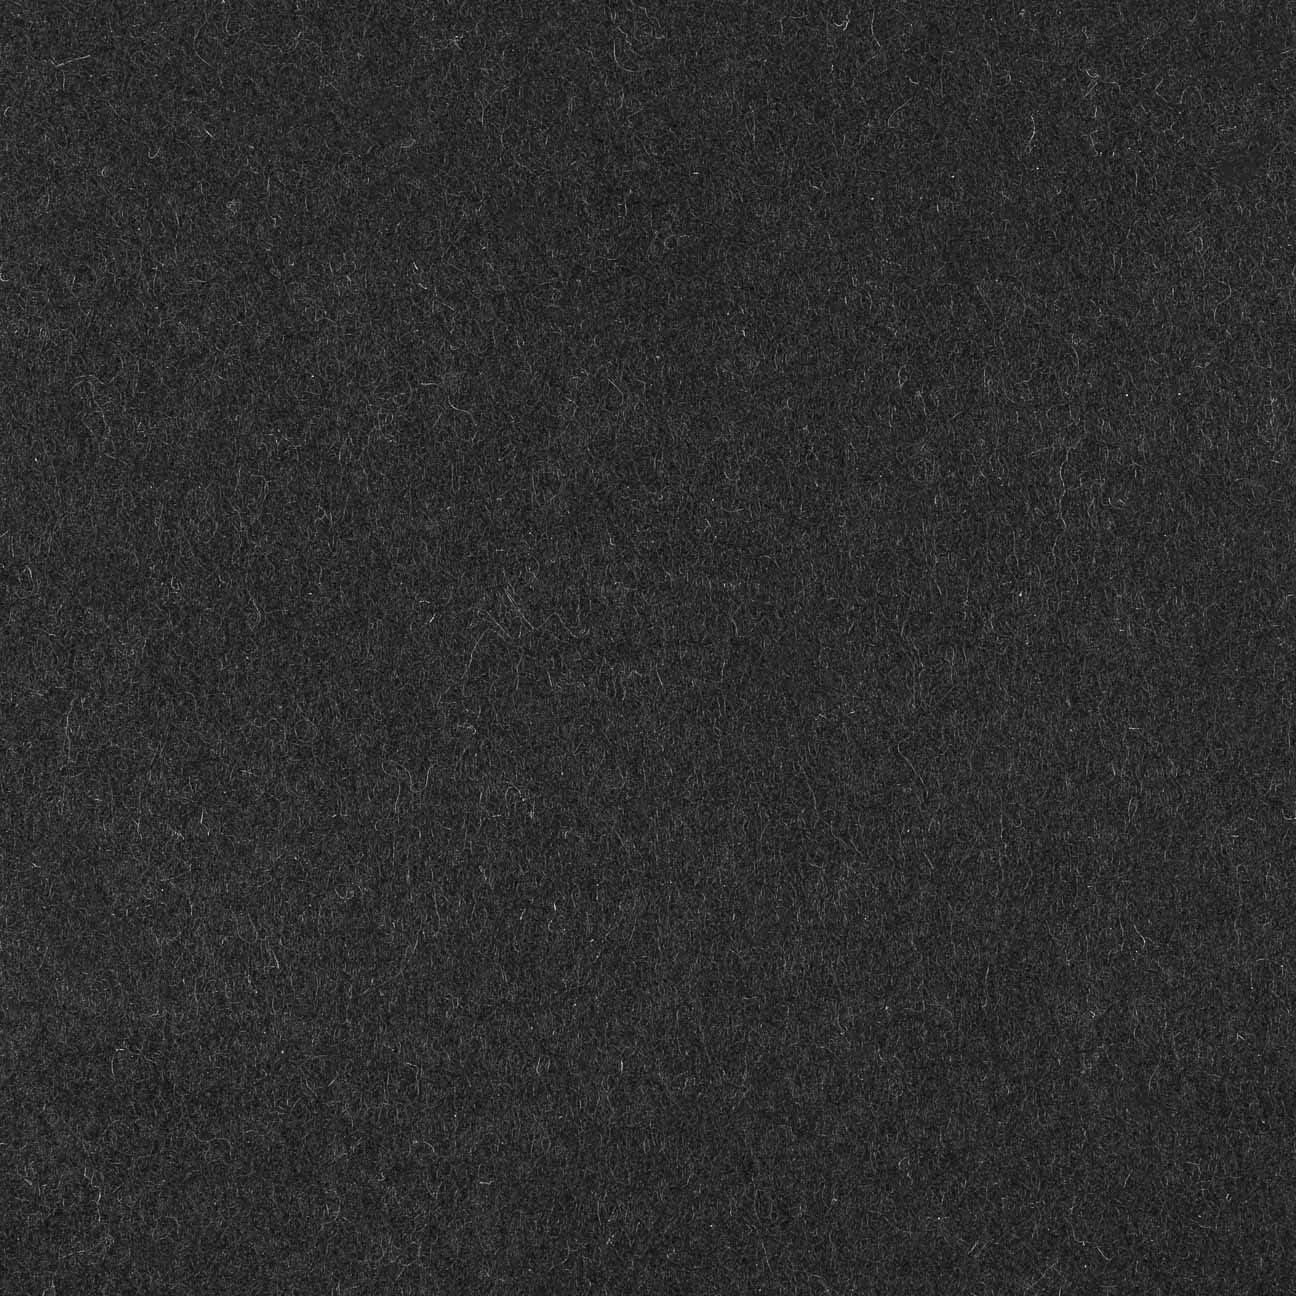 Gorra Tipo Boina Gorra Deportiva para Entretiempo e Invierno Lipodo Gorra Gatsby Sport Negro 59 cm Gorra de Corte Plano para Mujeres y Hombres